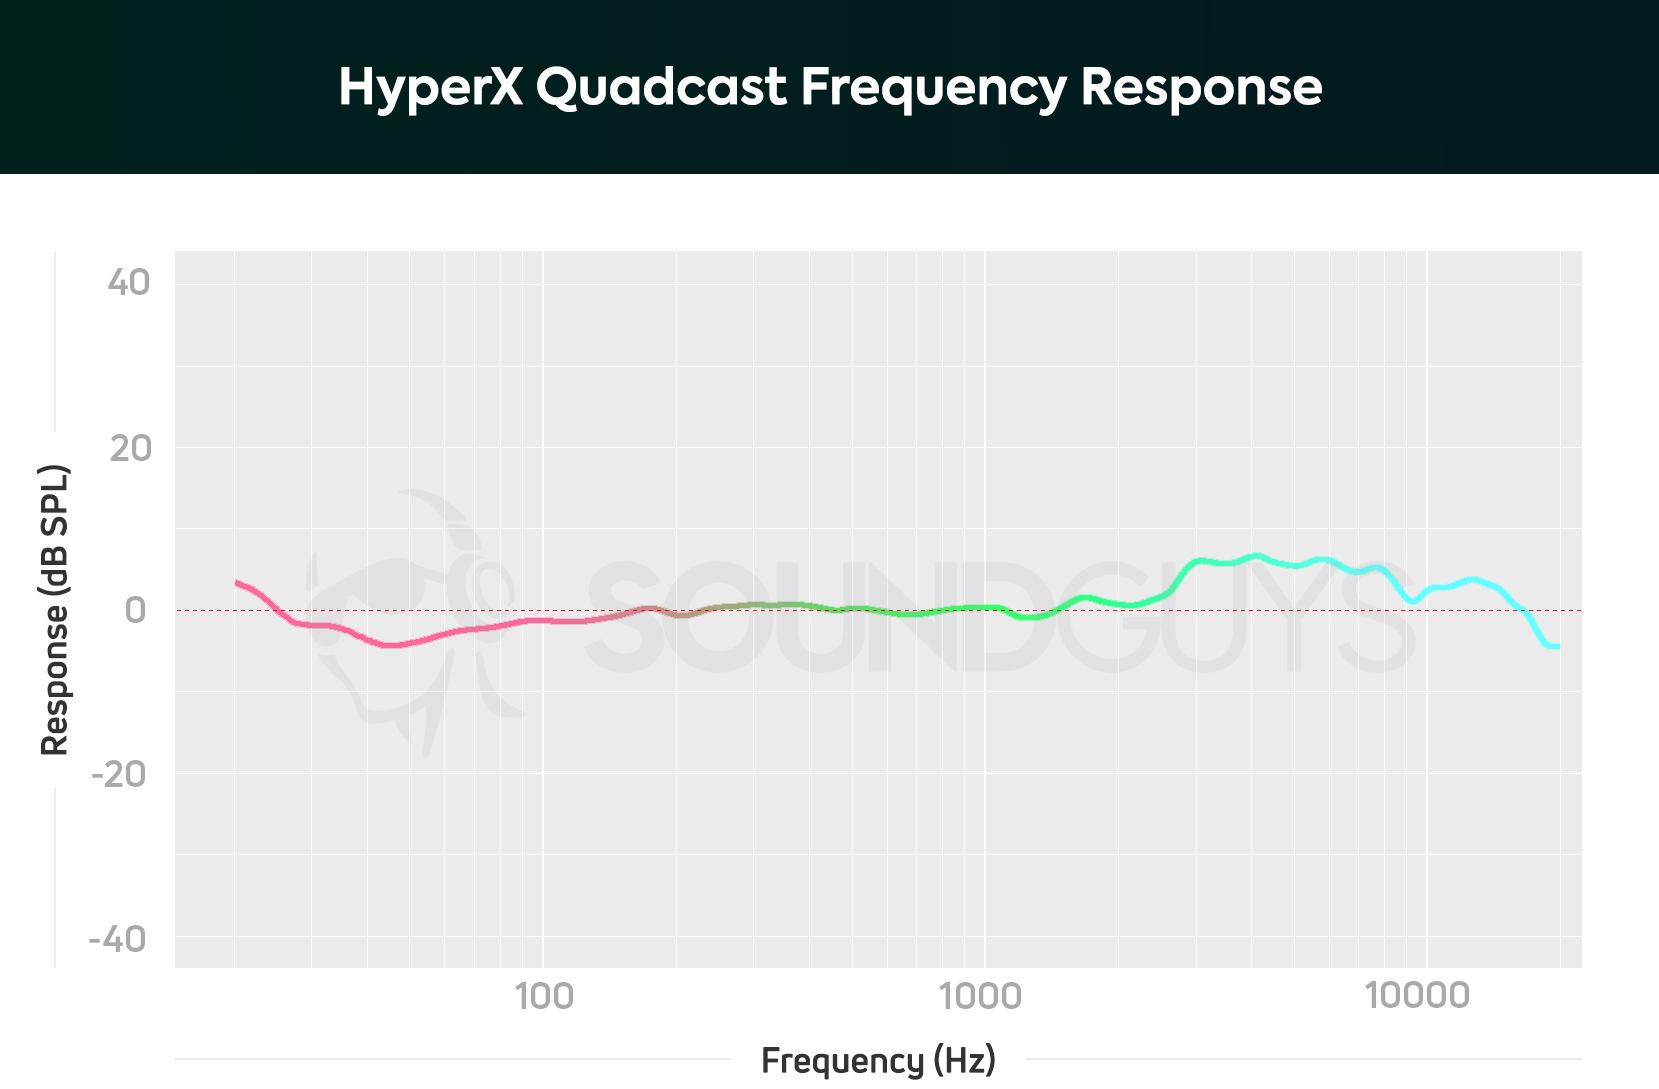 HyperX Quadcast microphone review - SoundGuys